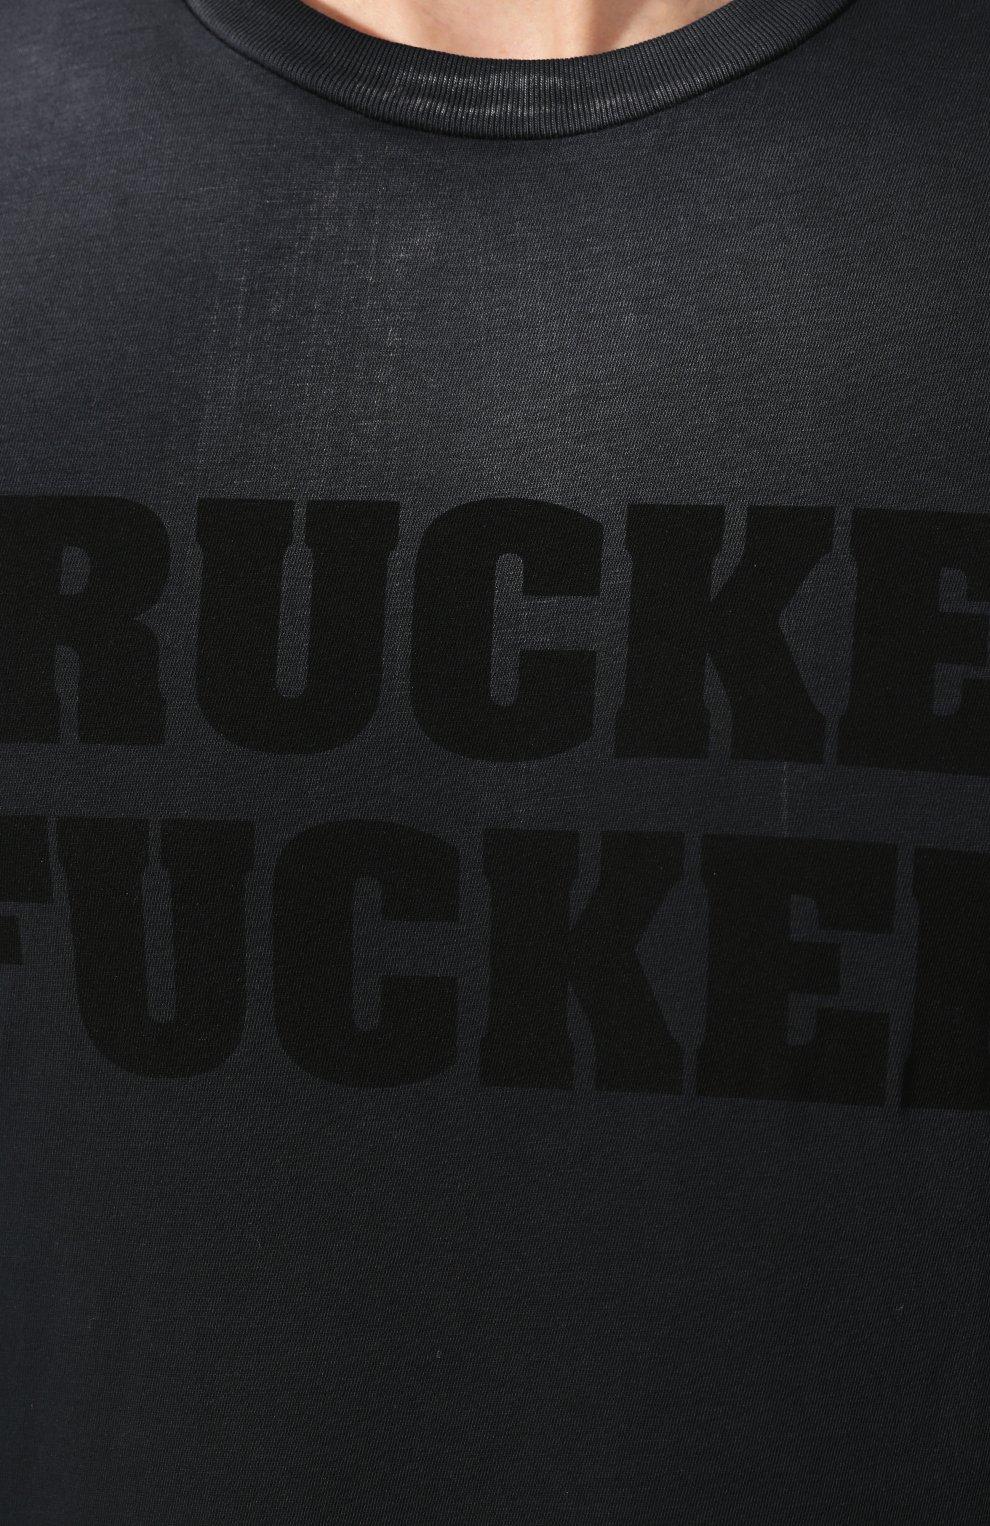 Мужская хлопковая футболка DSQUARED2 черного цвета, арт. S74GD0641/S21600   Фото 5